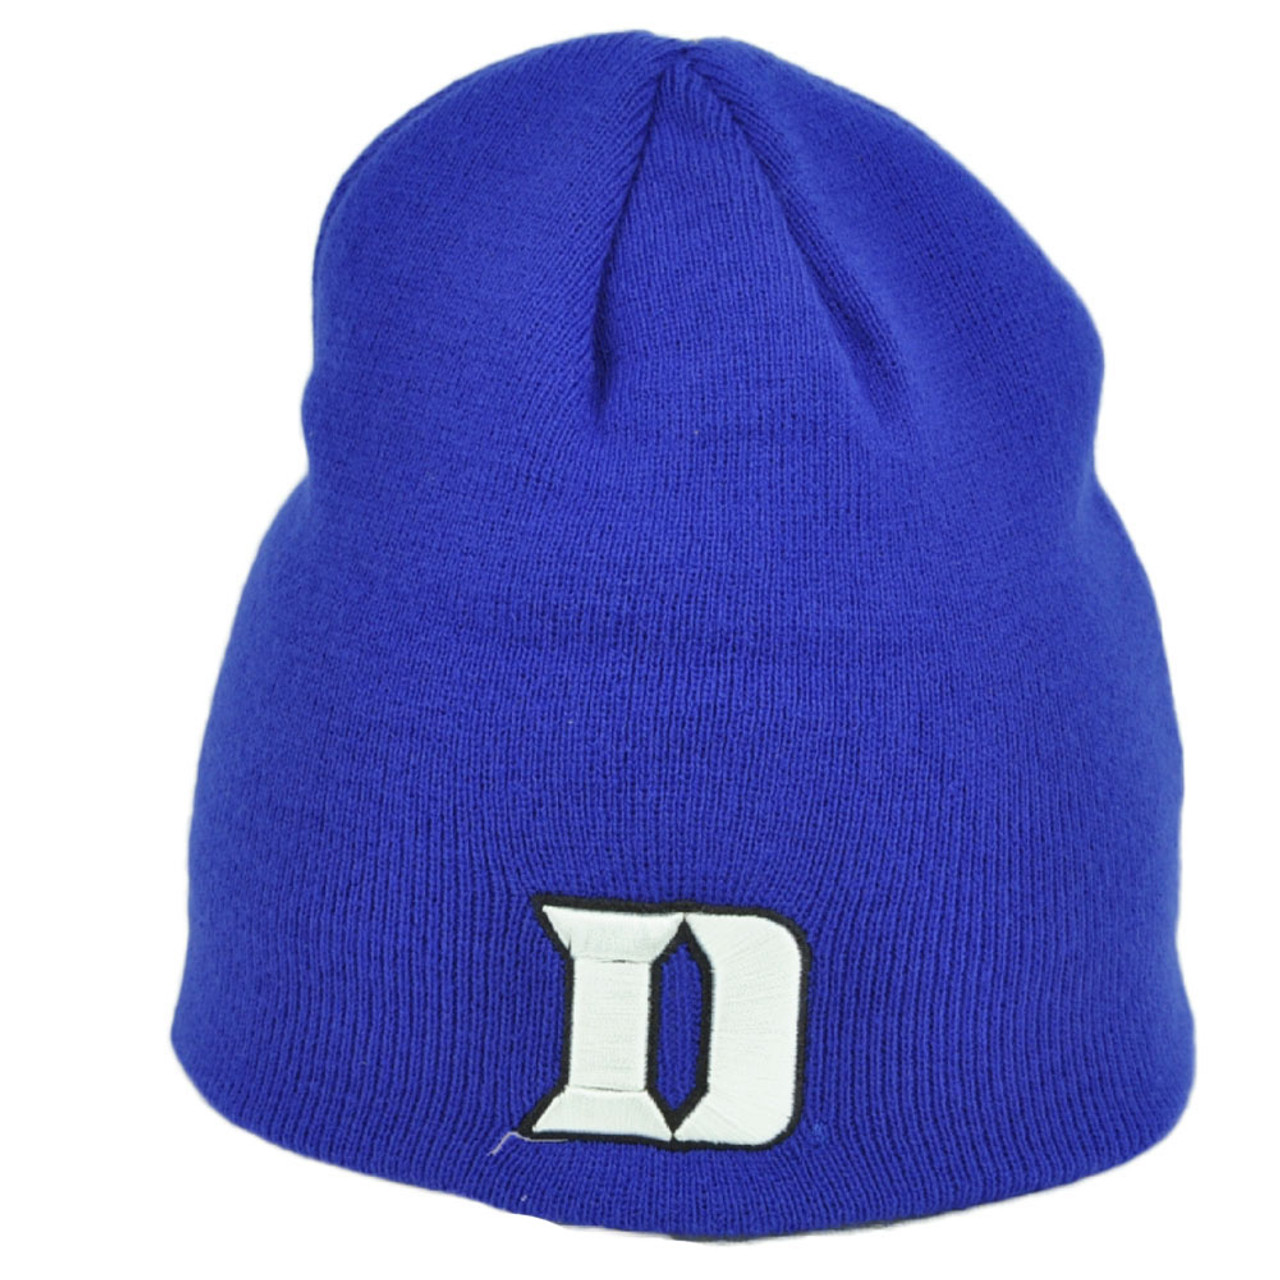 promo code 97d1a 8e1a3 NCAA Zephyr Duke Blue Devils Cuffless Knit Beanie Hat Skully Sports Winter